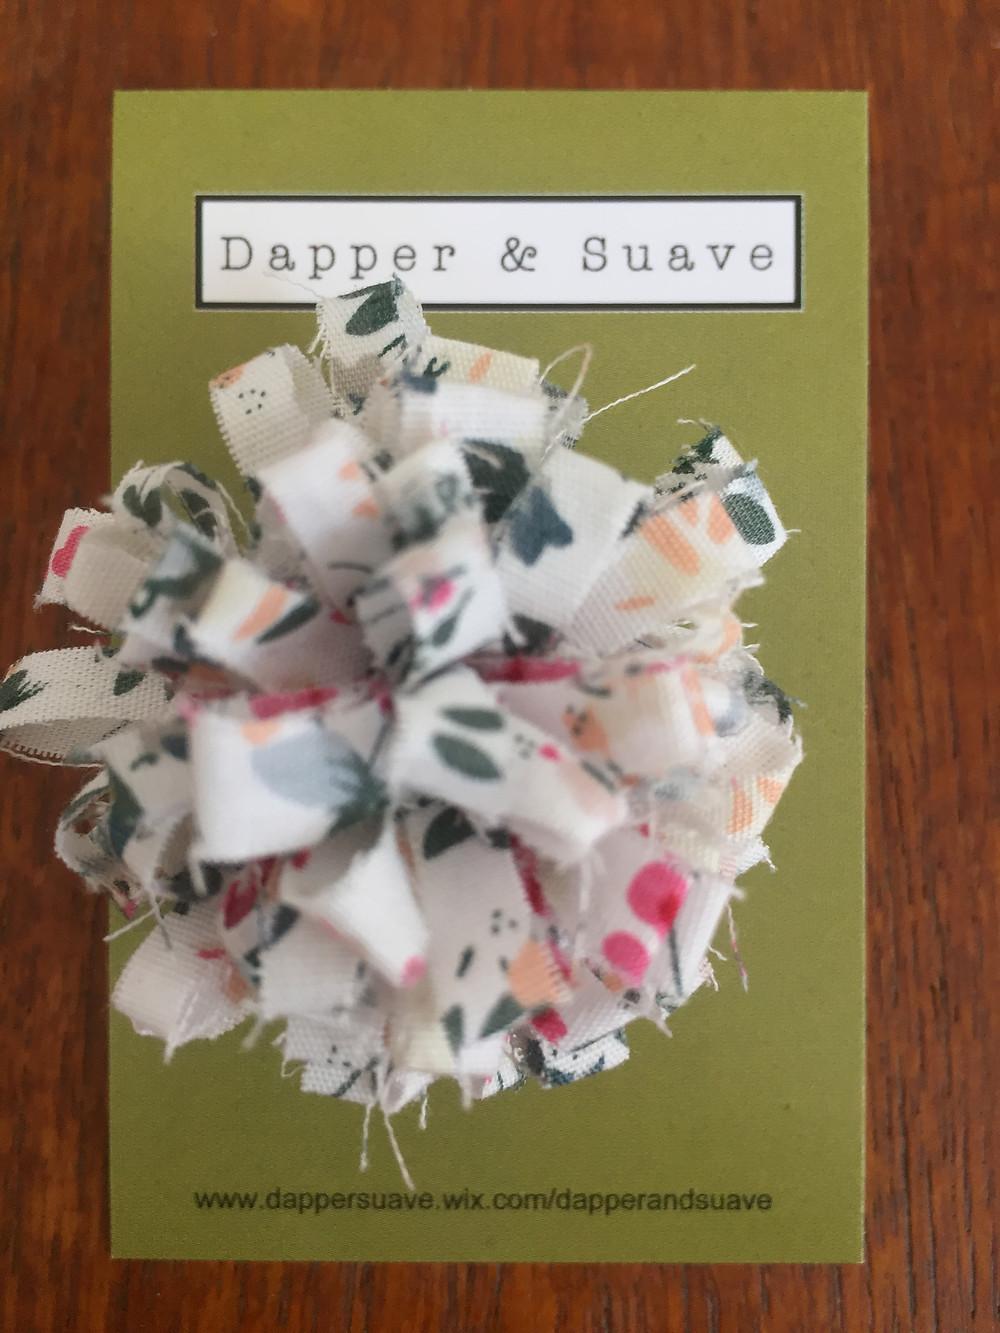 Dapper & Suave White Floral Lapel Pin